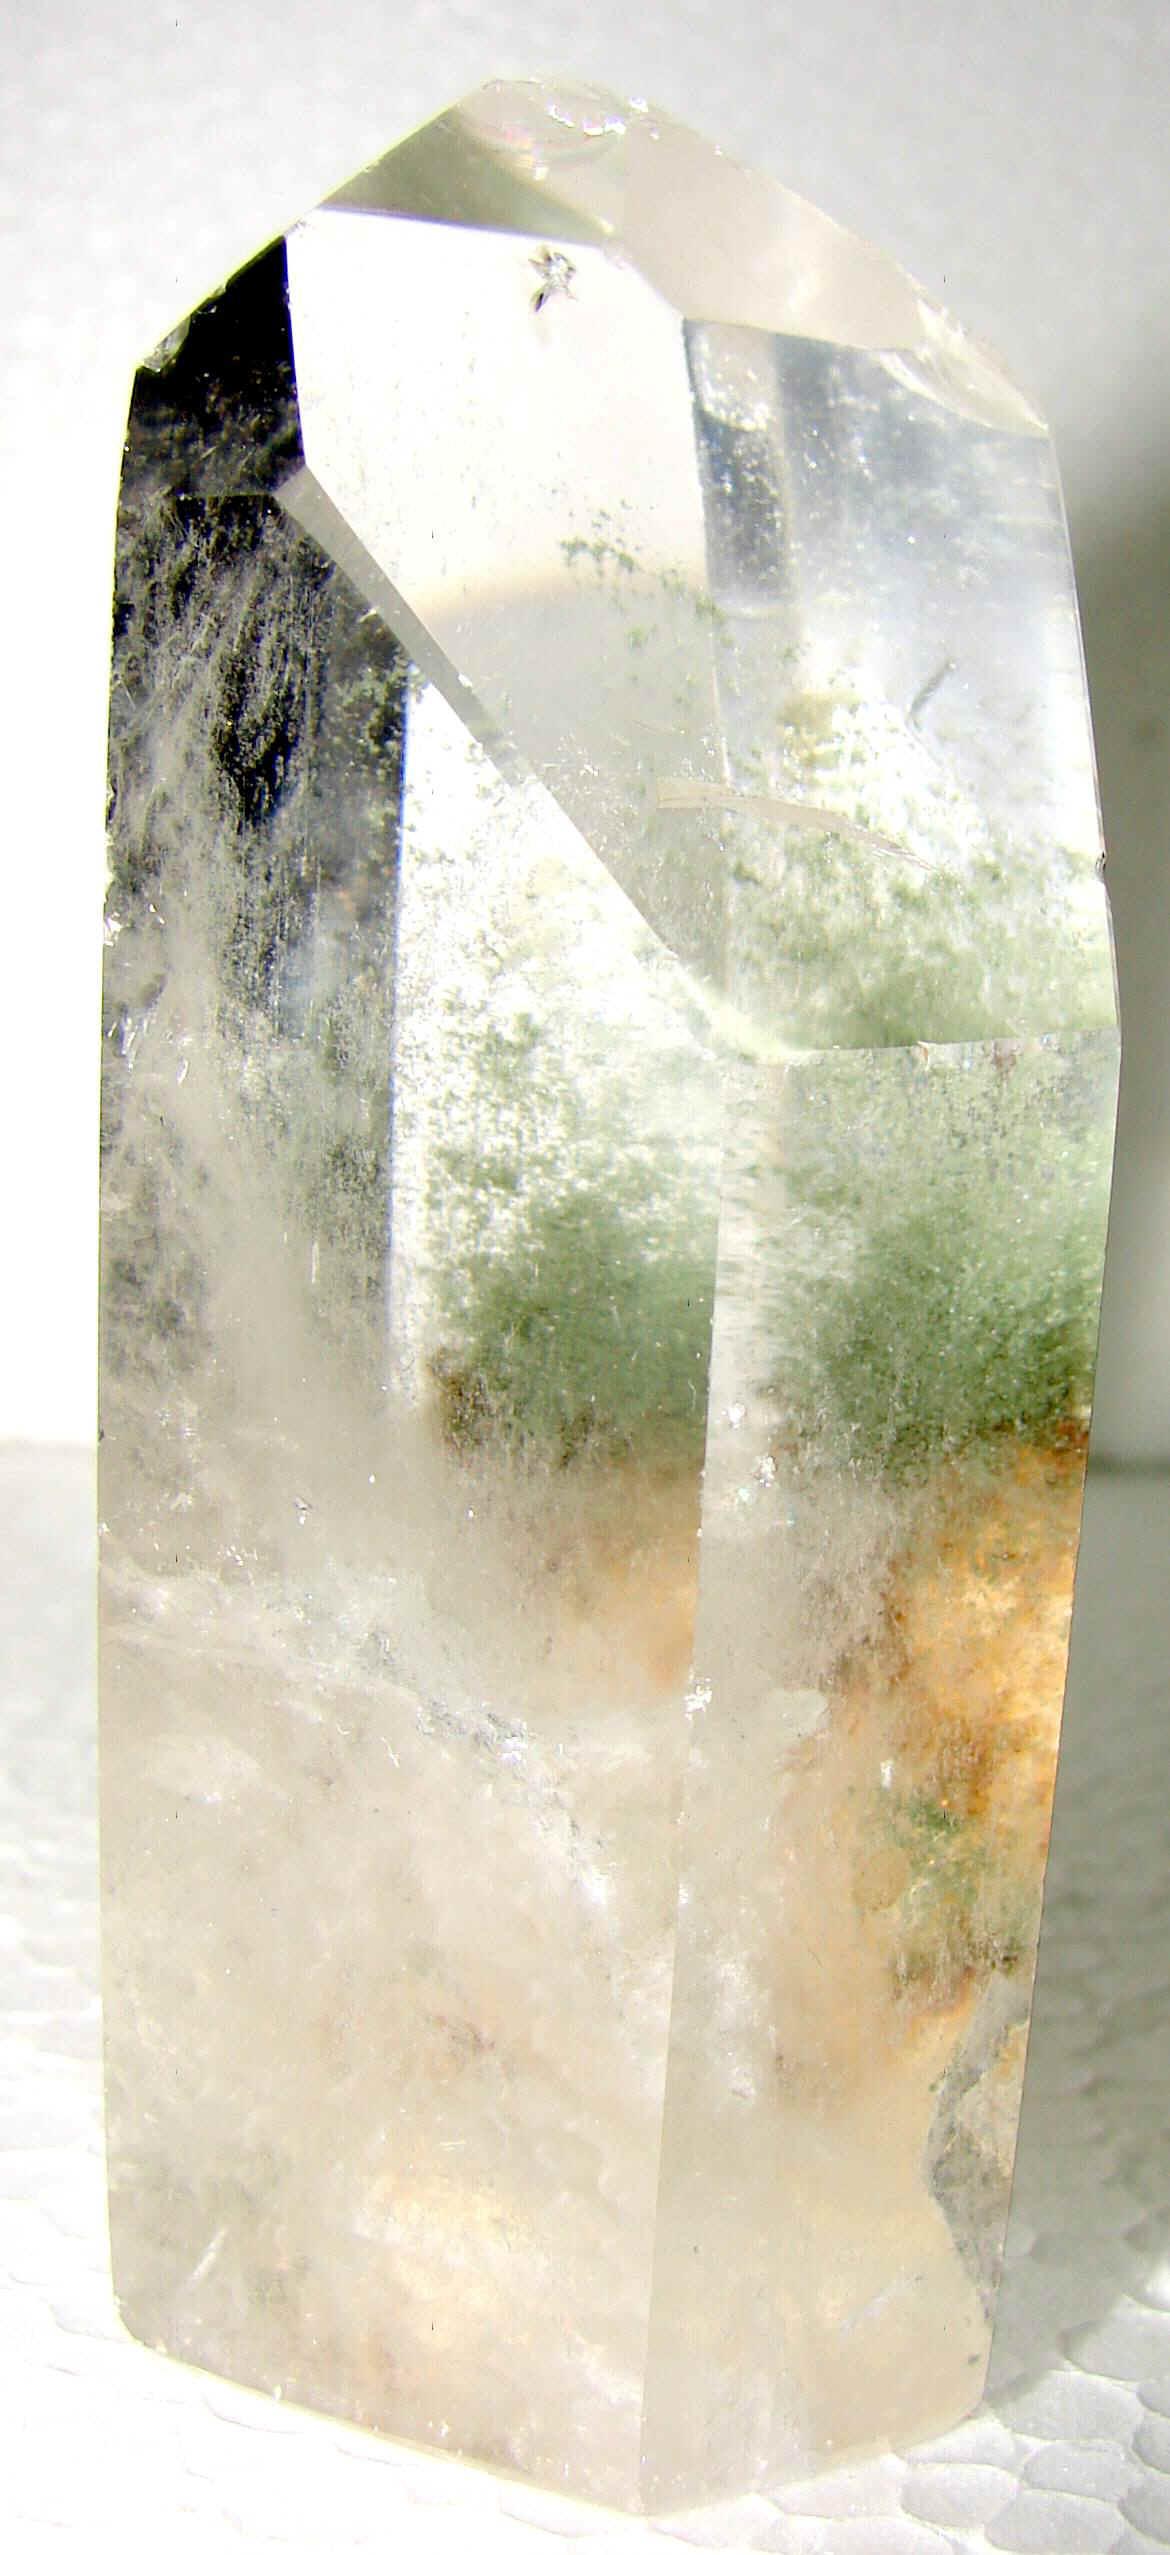 http://www.quartzcrystals.net/nuchl-12.jpg (807370 bytes)